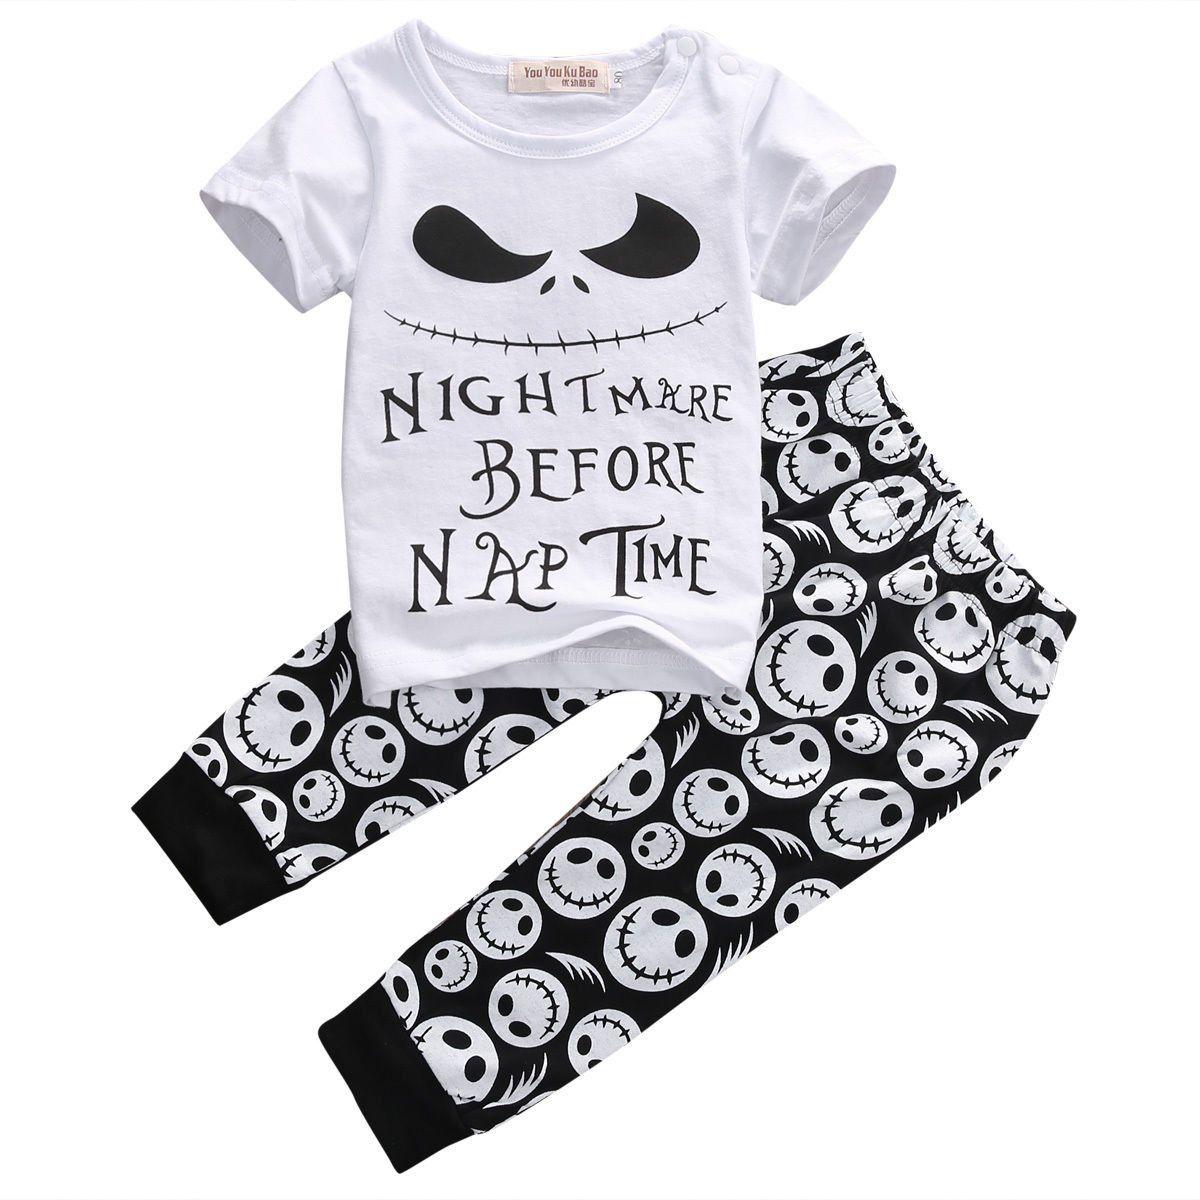 New 2pcs Baby Boys Casual T Shirt Skull Pants Outfits